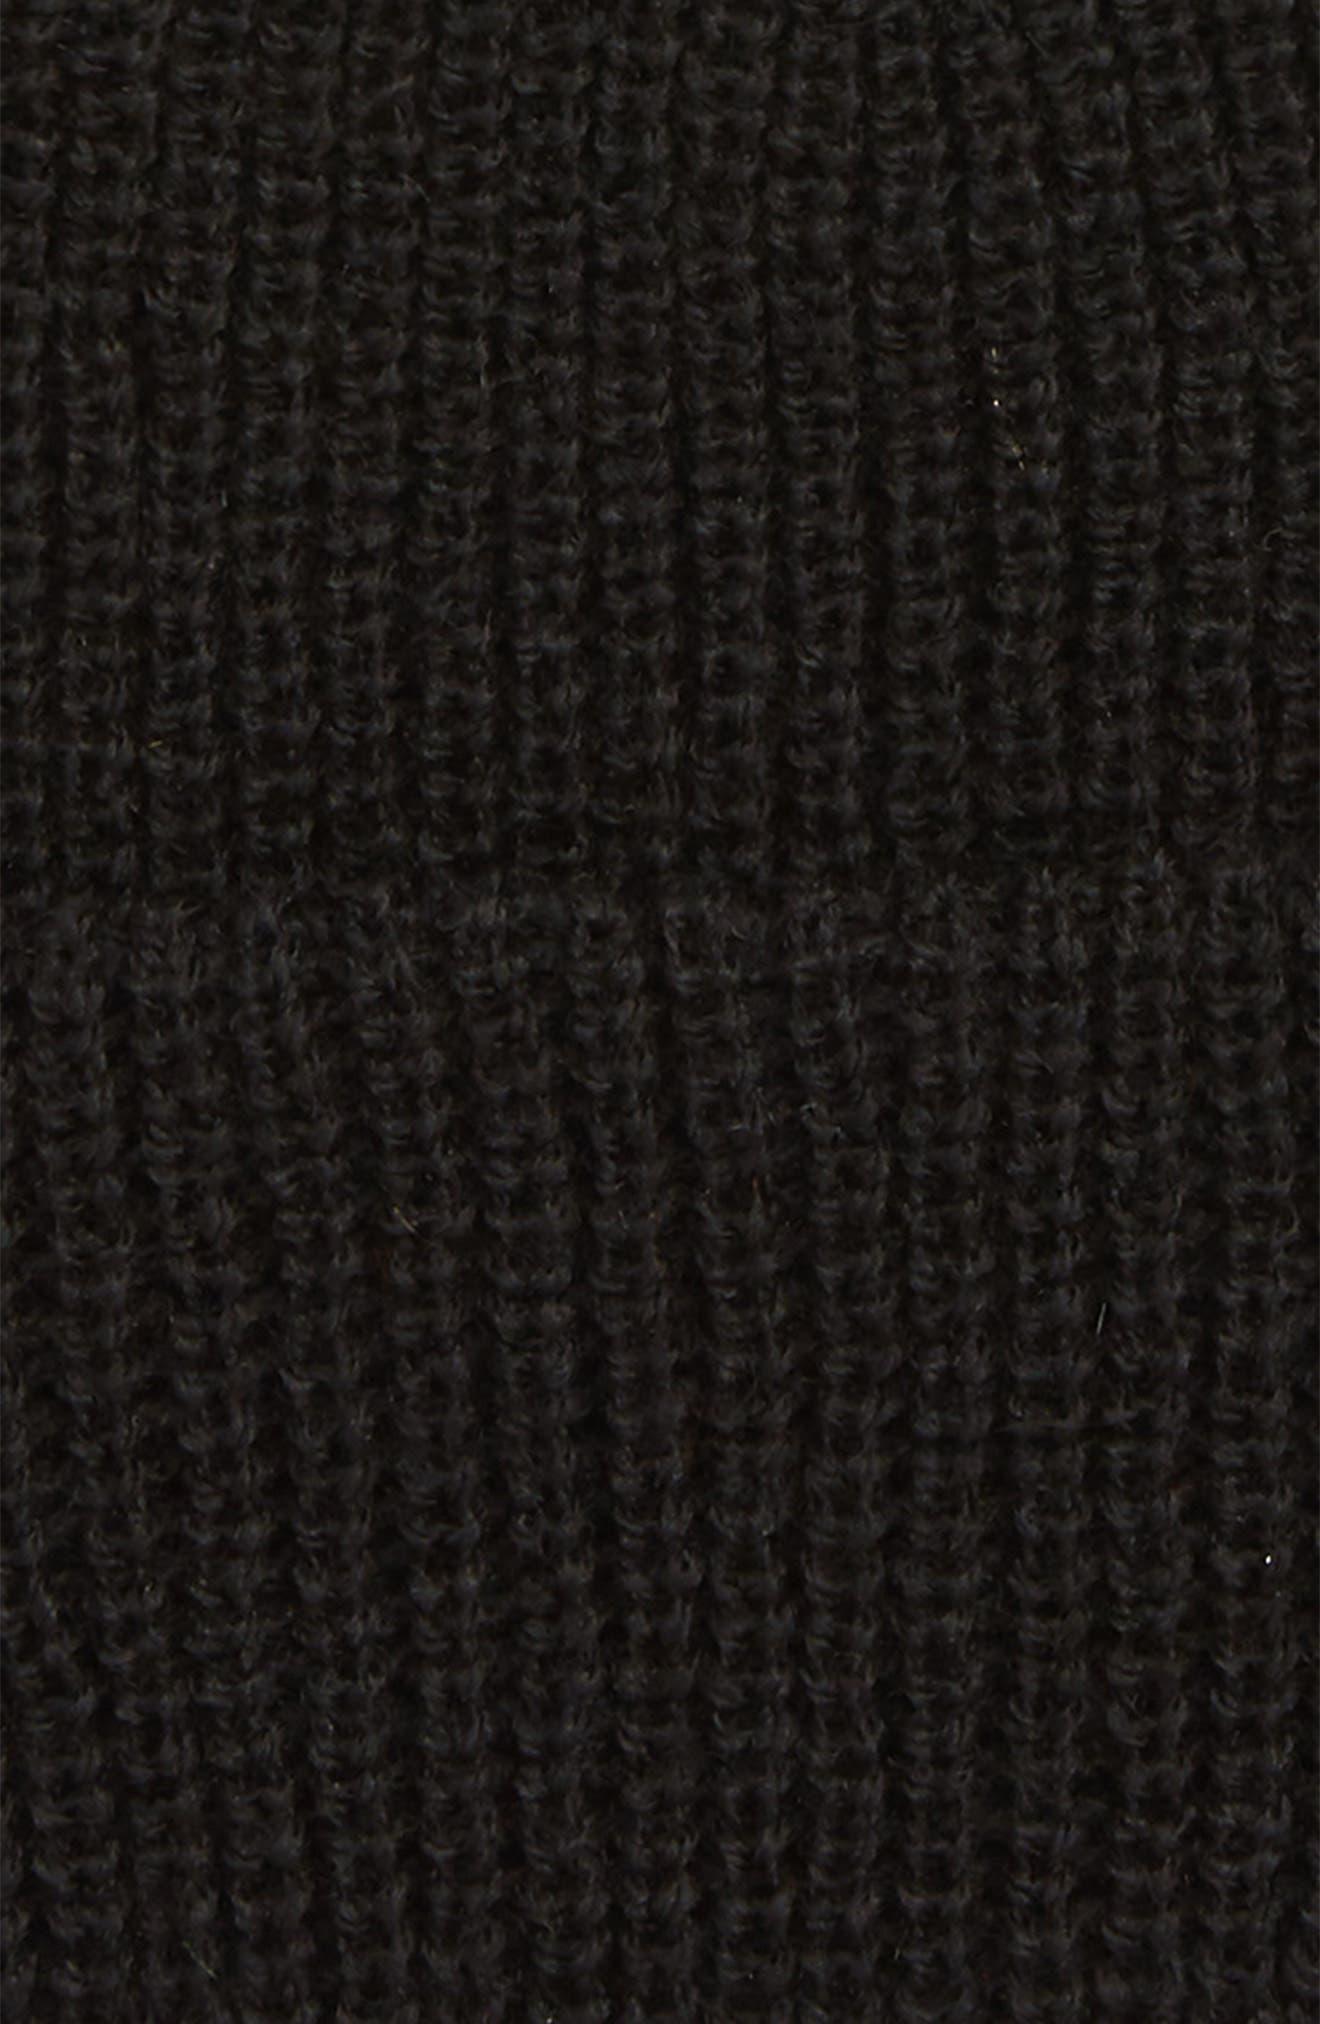 Lil Heist Beanie Hat,                             Alternate thumbnail 2, color,                             001